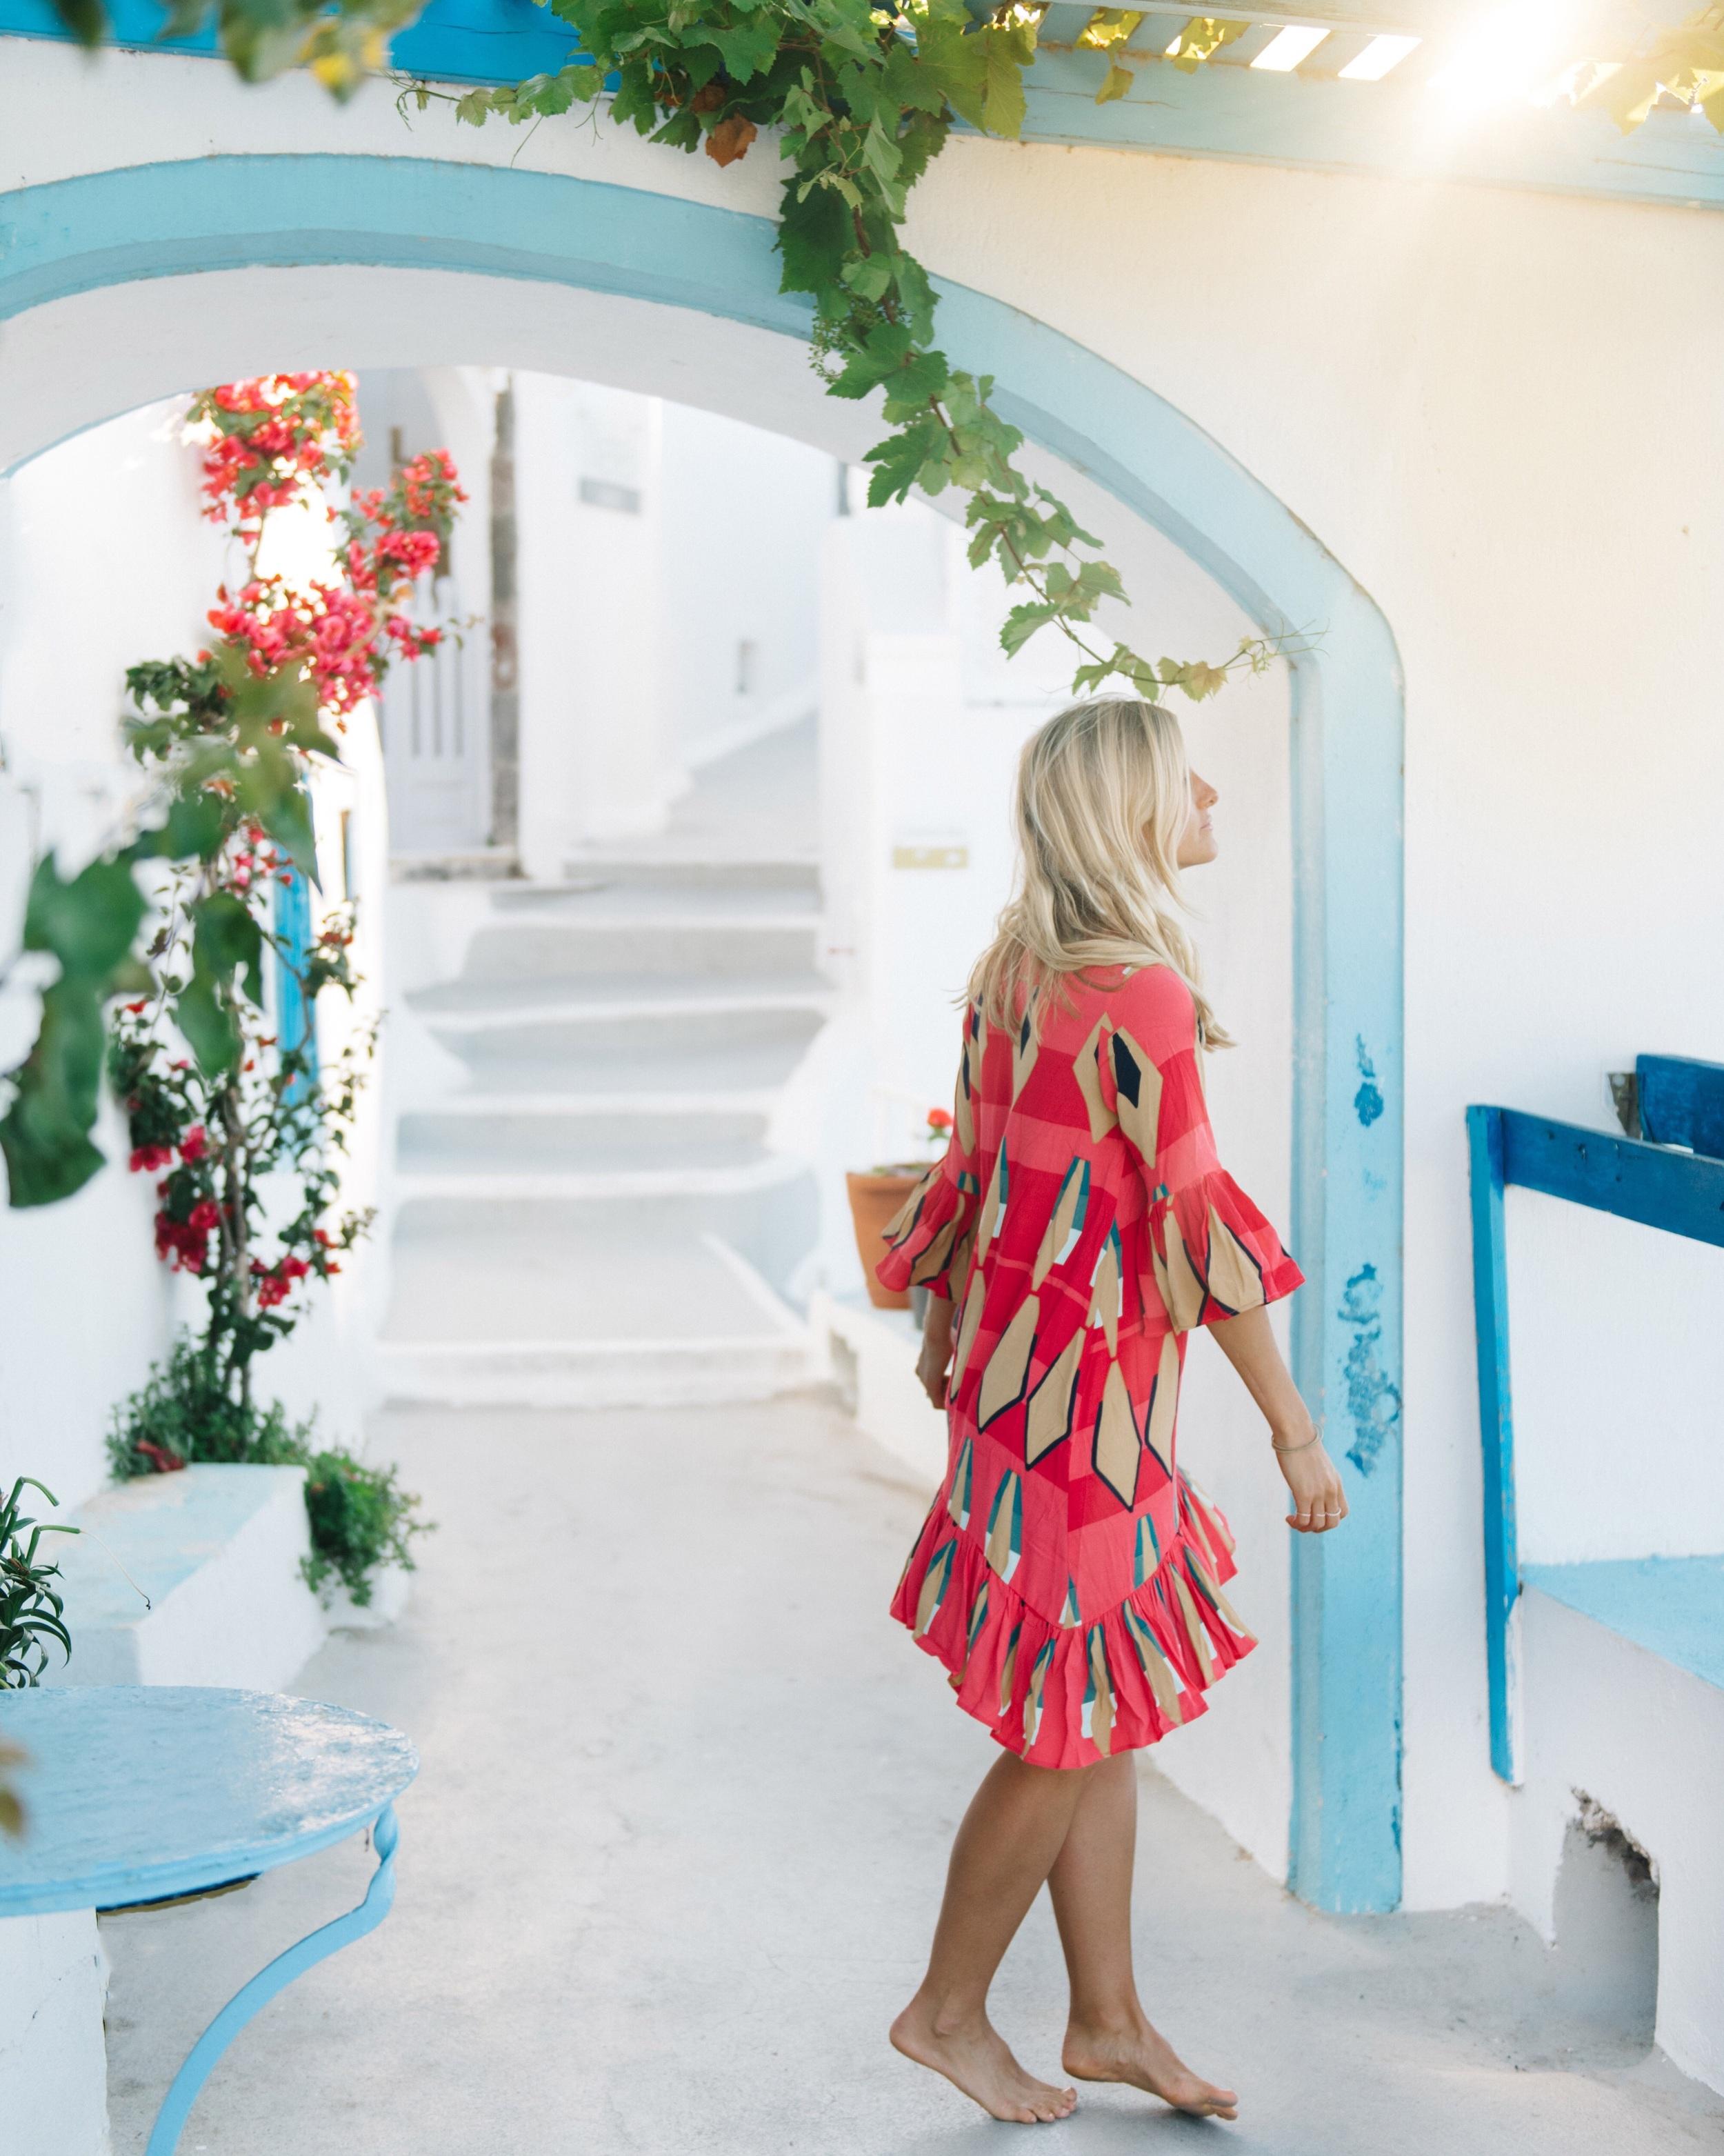 Streets of Santorini, Fira. Dress: Mister Zimi